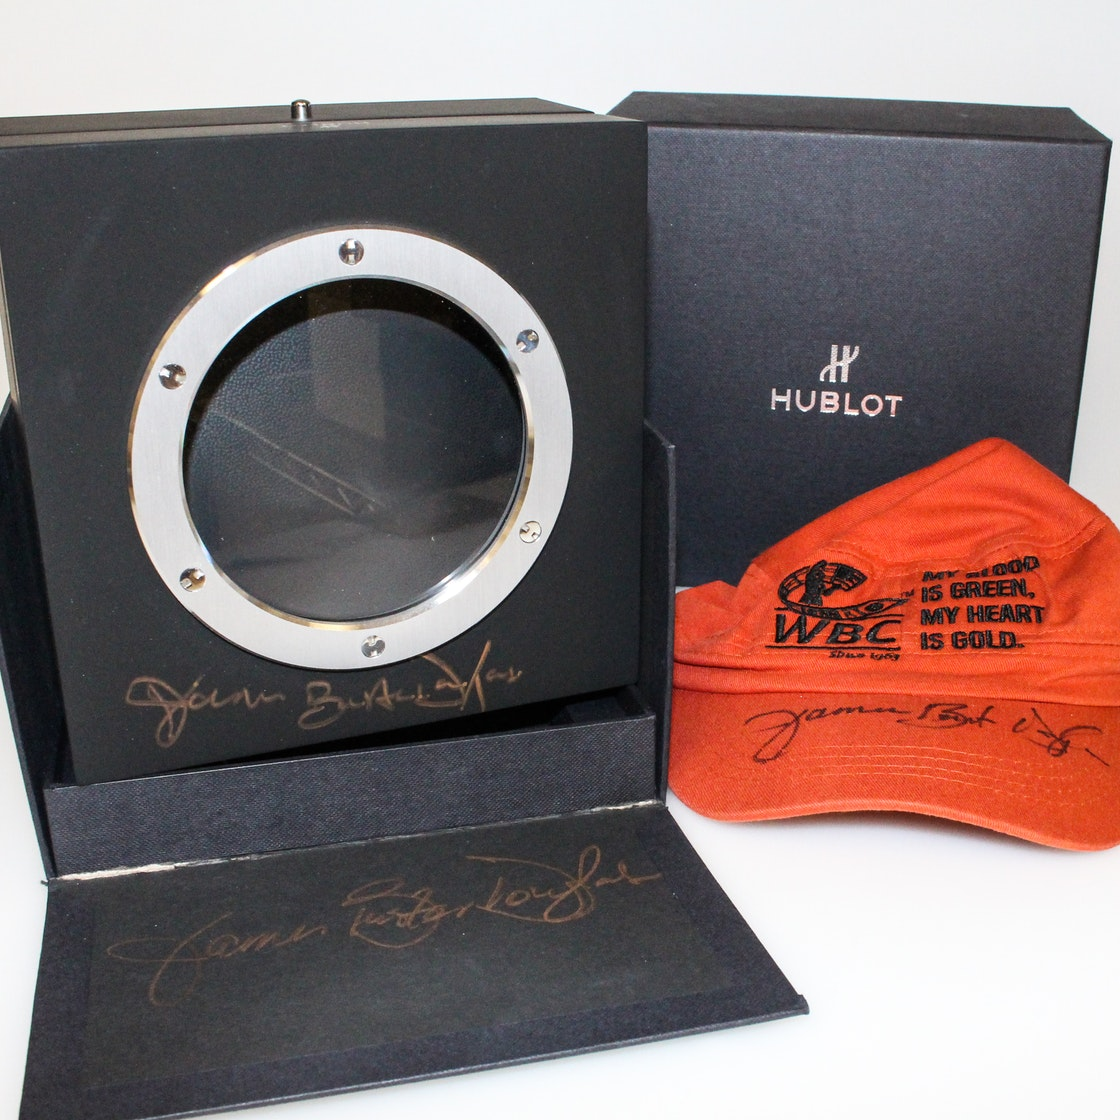 Hublot Classic Fusion Aerofusion Chronograph WBC Limited Edition 525.CQ.1181.RX.WBC16